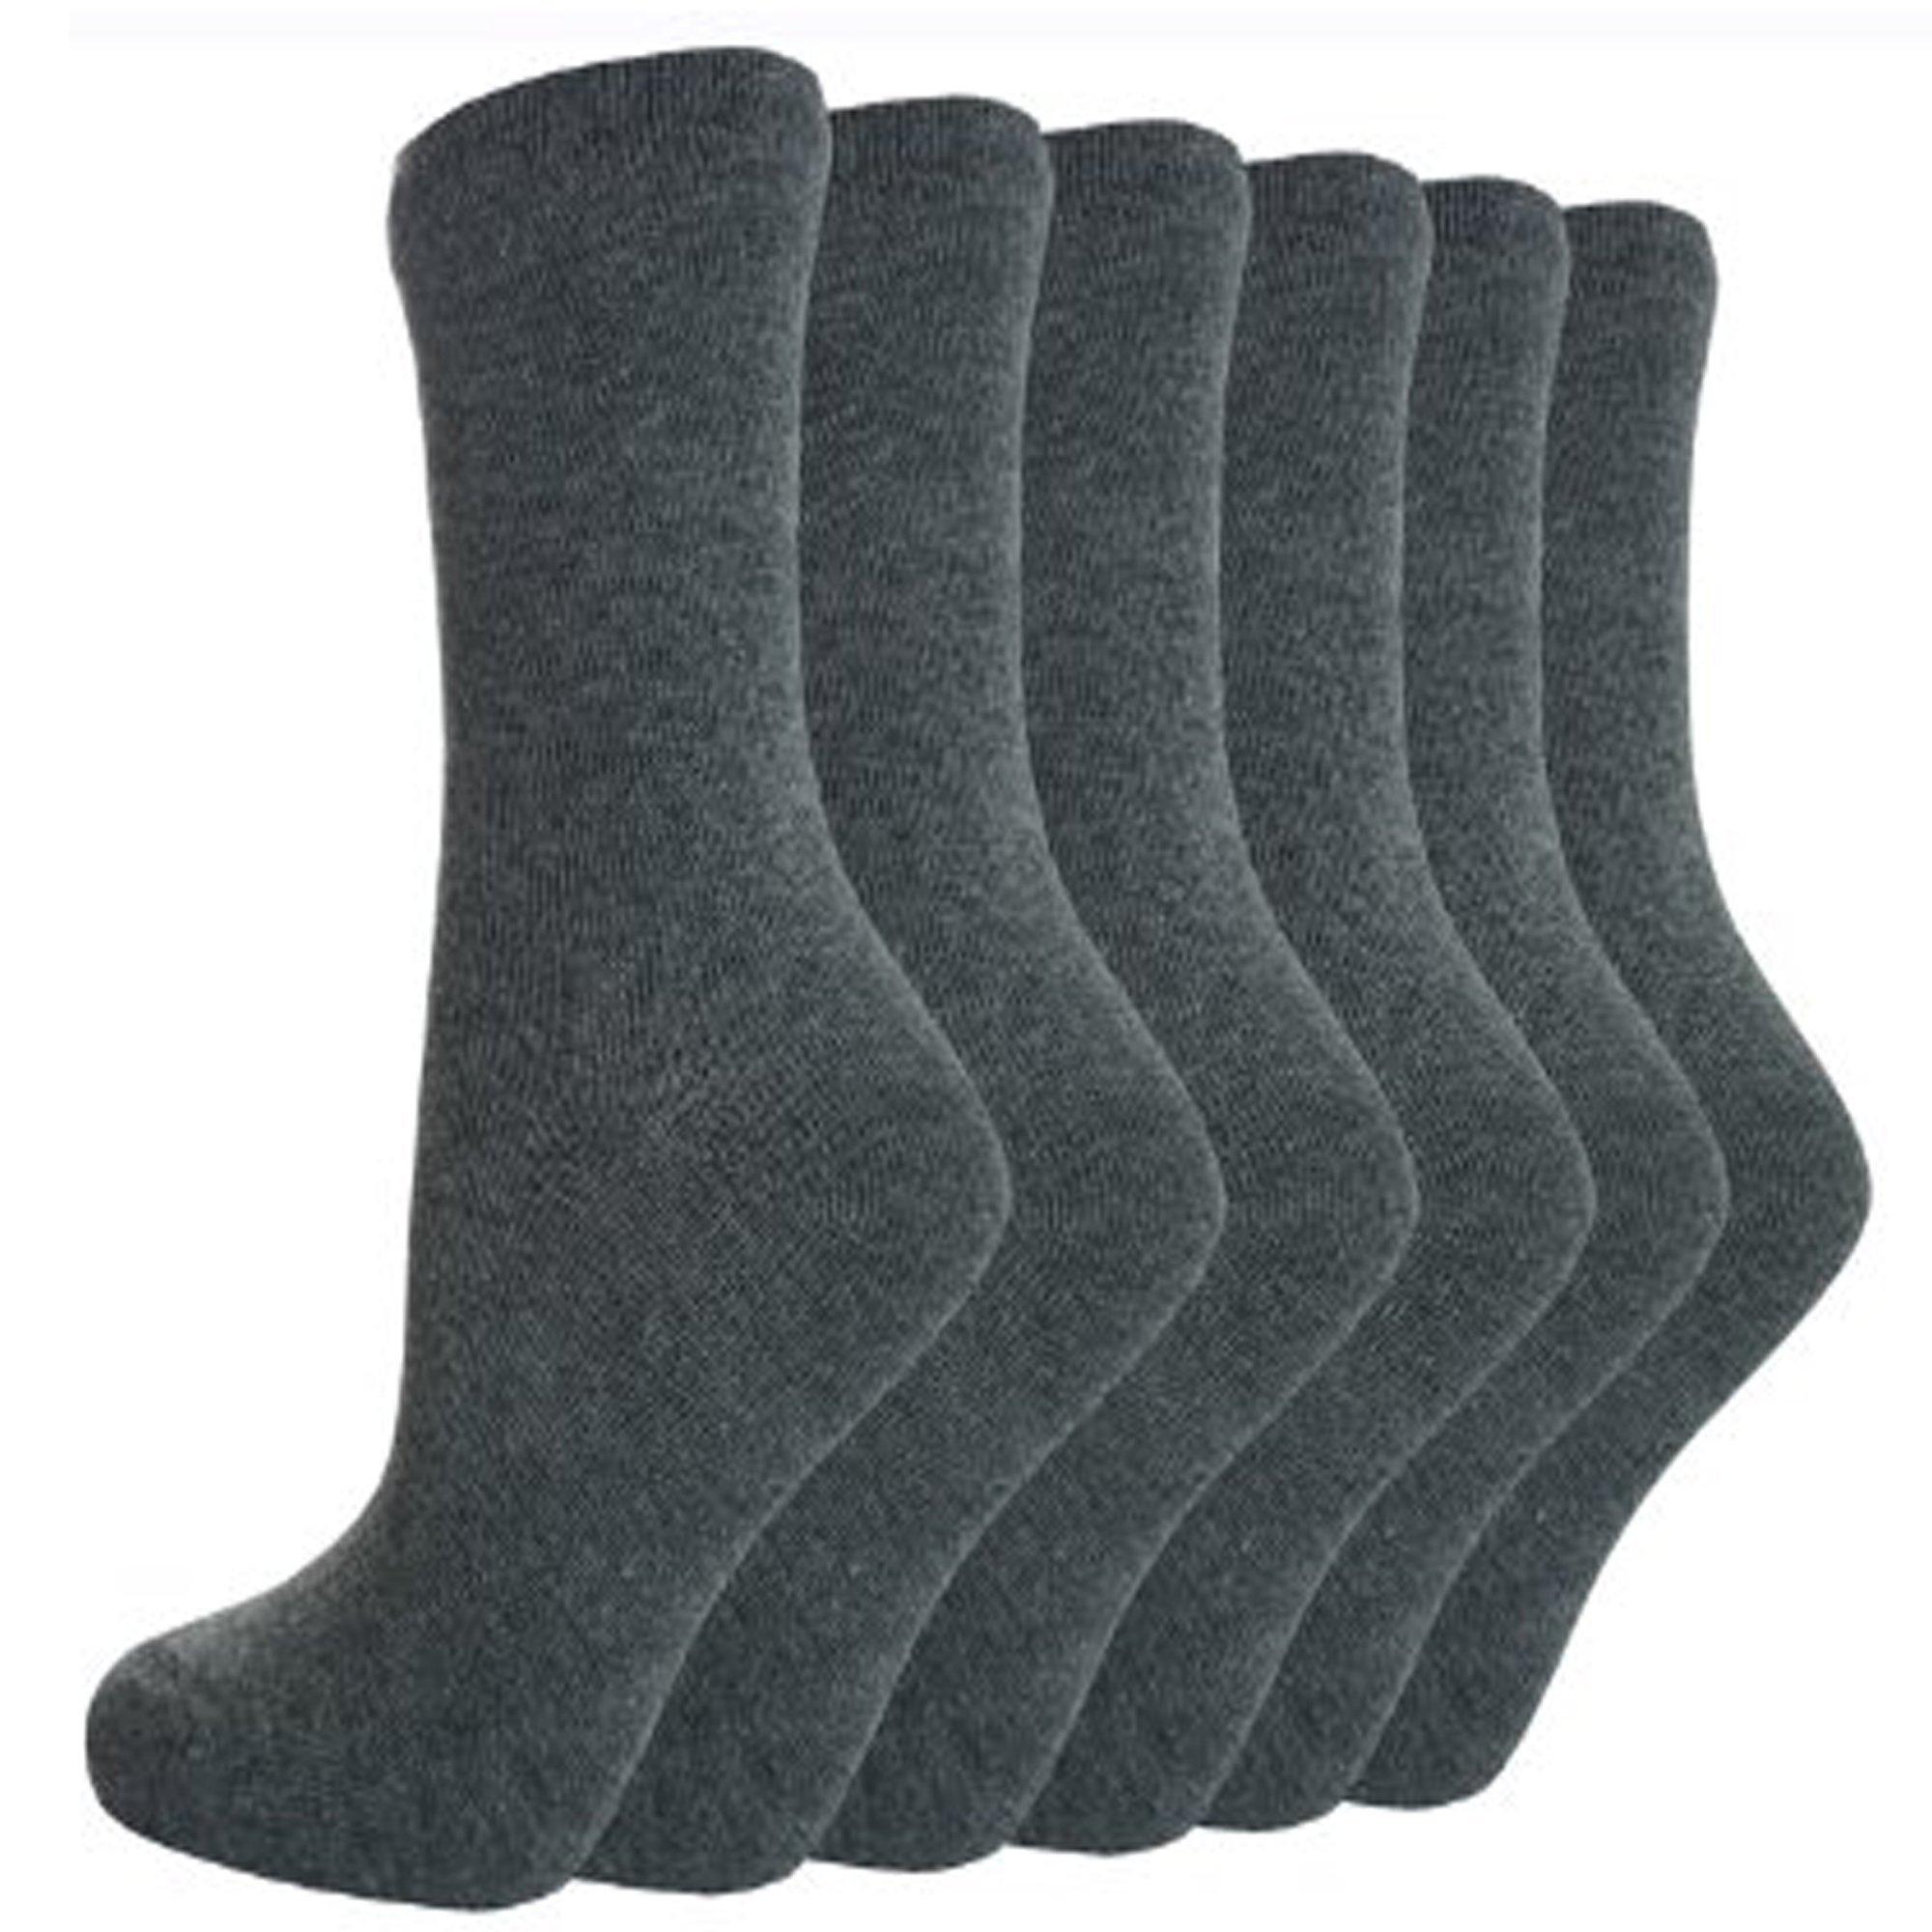 Unisex Ankle Back To School Socks Girls Boys Plain Cotton Rich Children Kids